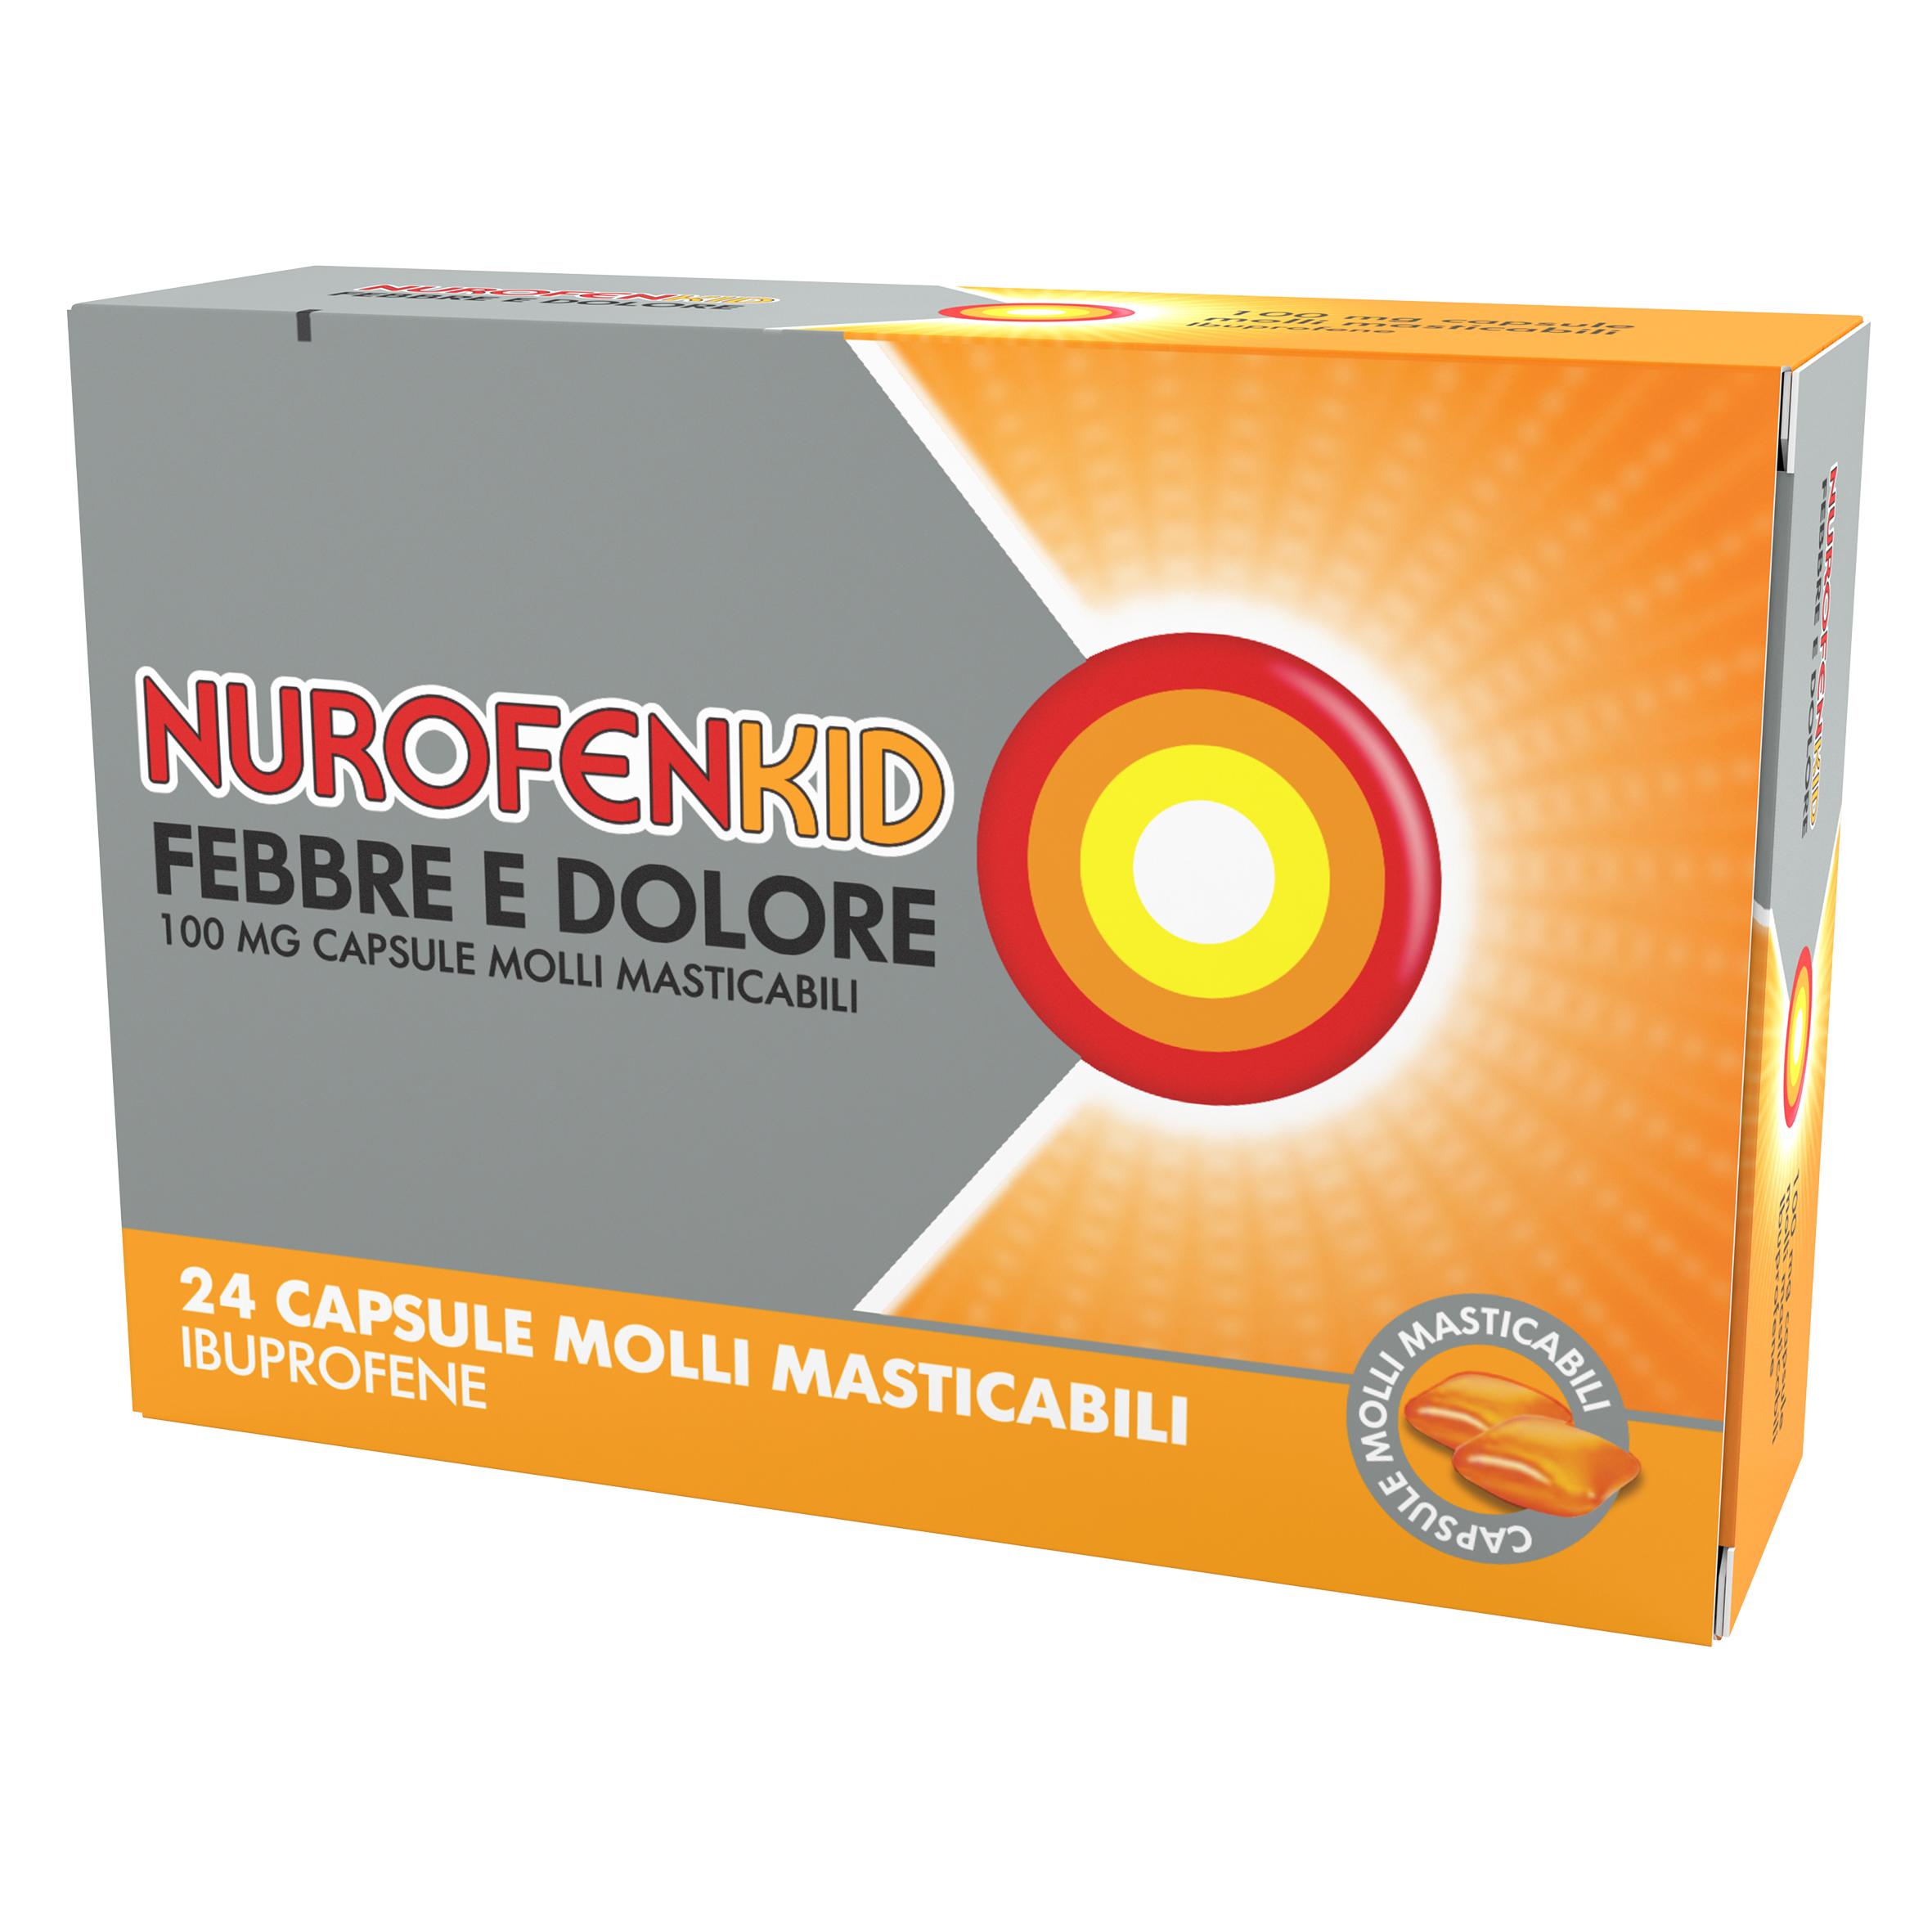 Nurofenkid Febbre D 100 Mg Capsule Molli Masticabili 24 Capsule In Blister Pvc/Pe/Pvdc/Al